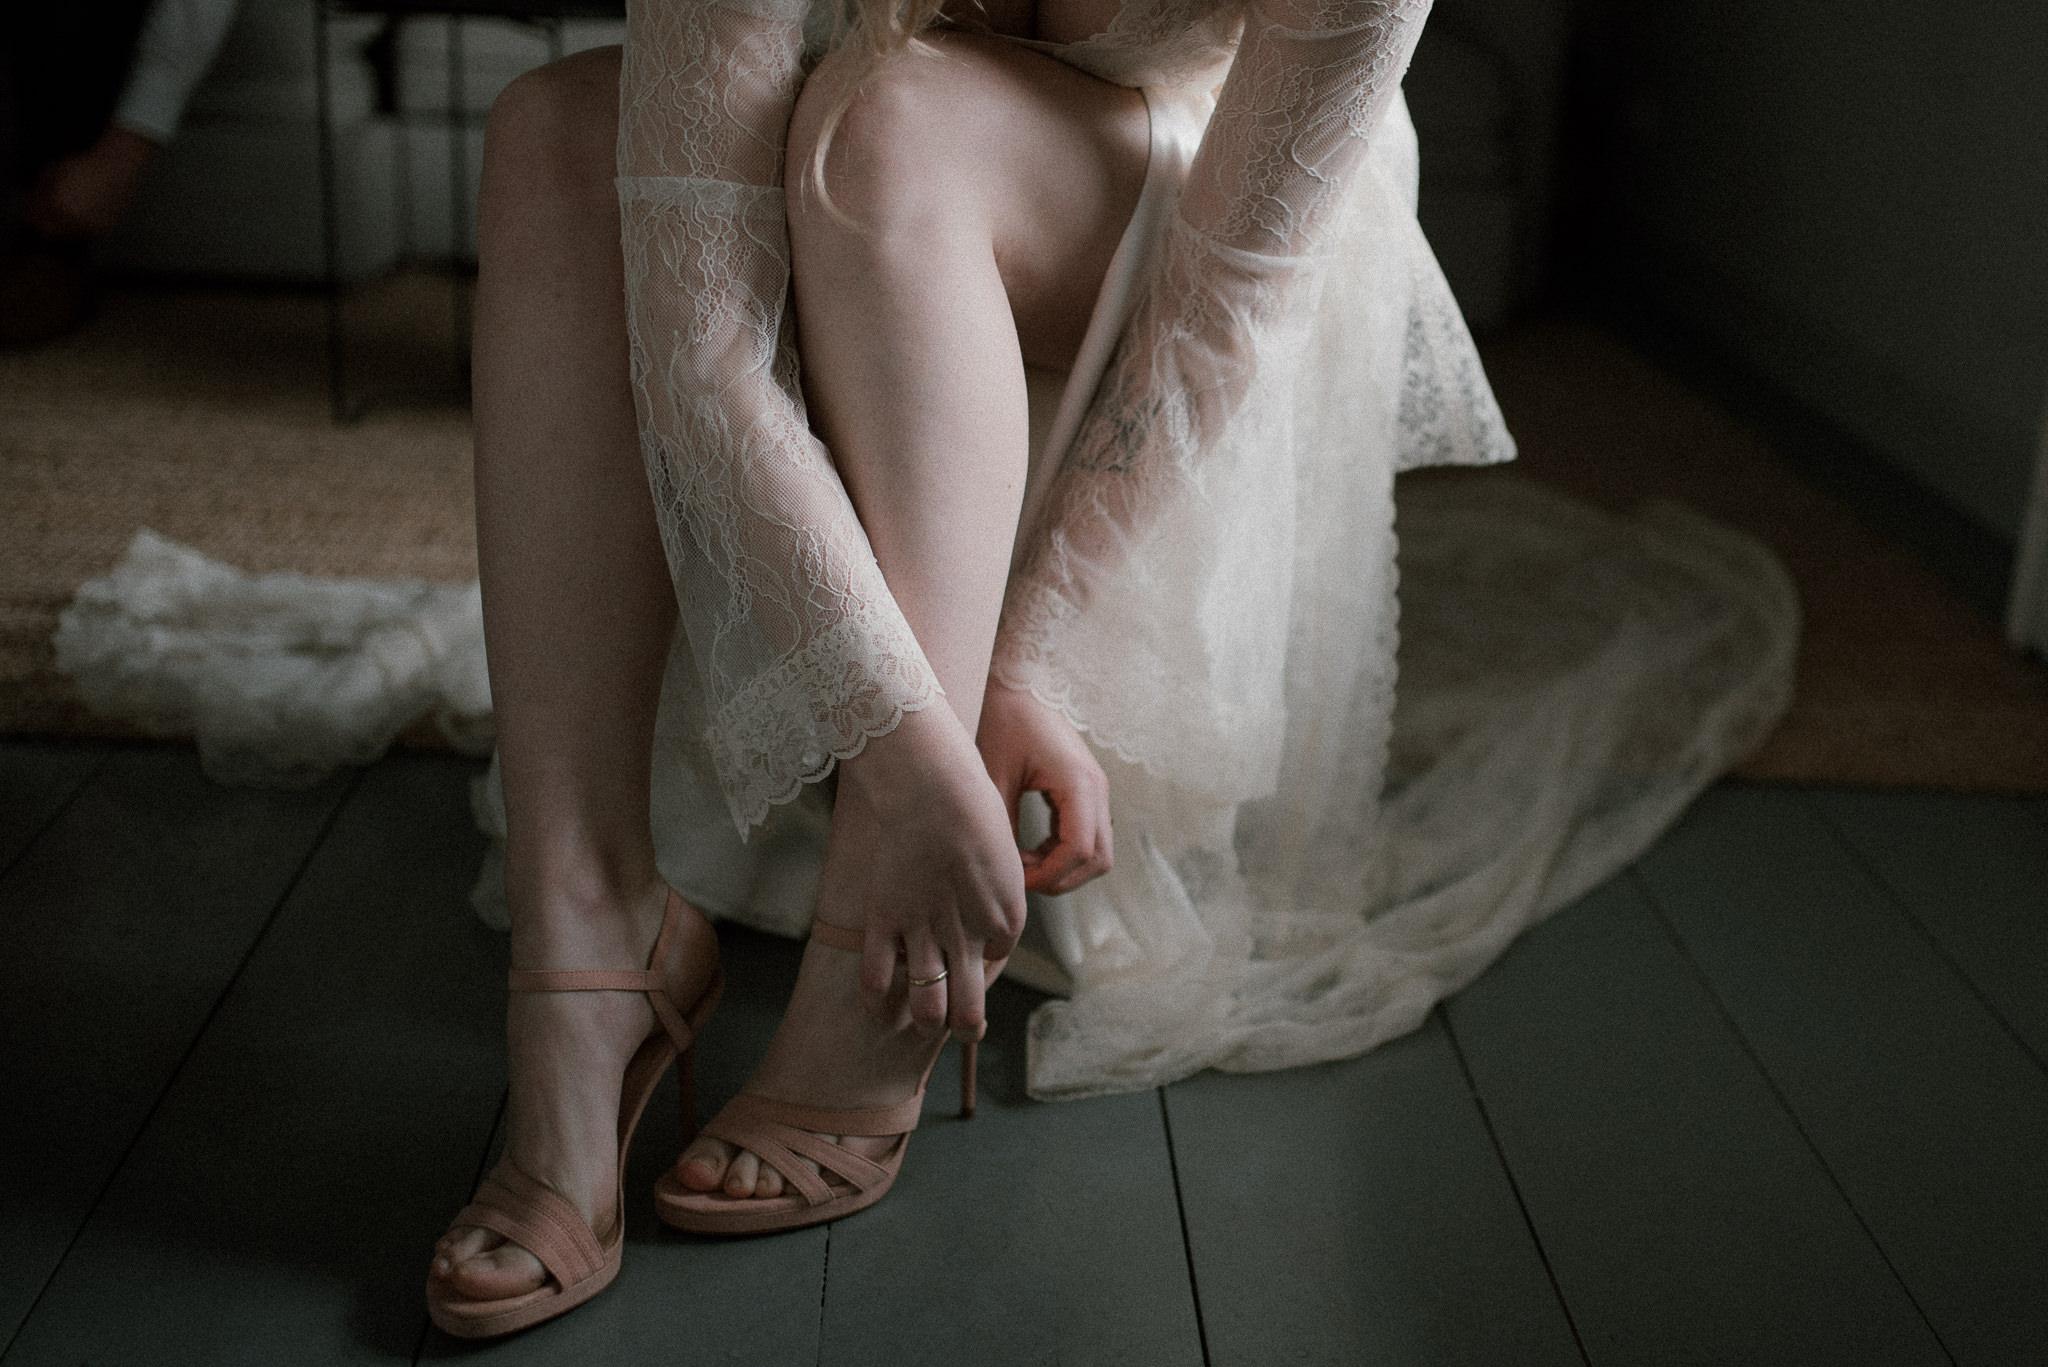 Moody winterbruiloft - Naomi van der Kraan - 03.jpg